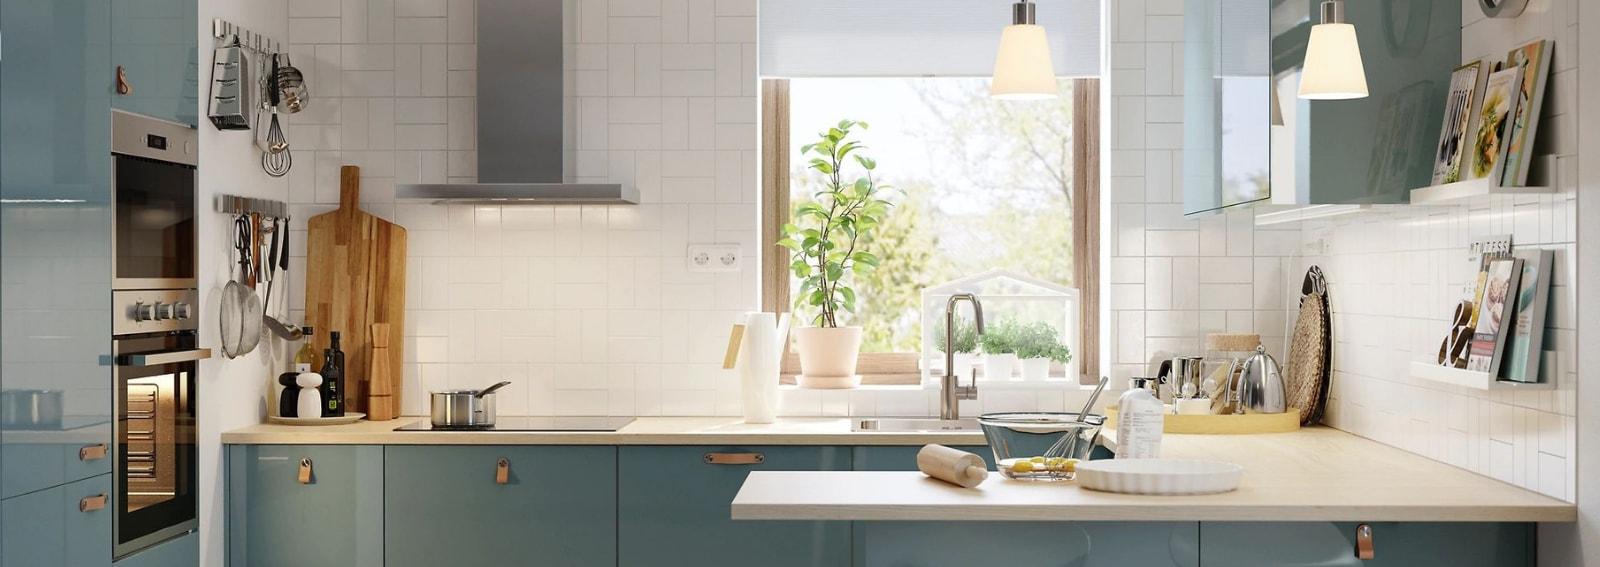 Cucina piccola_Desktop